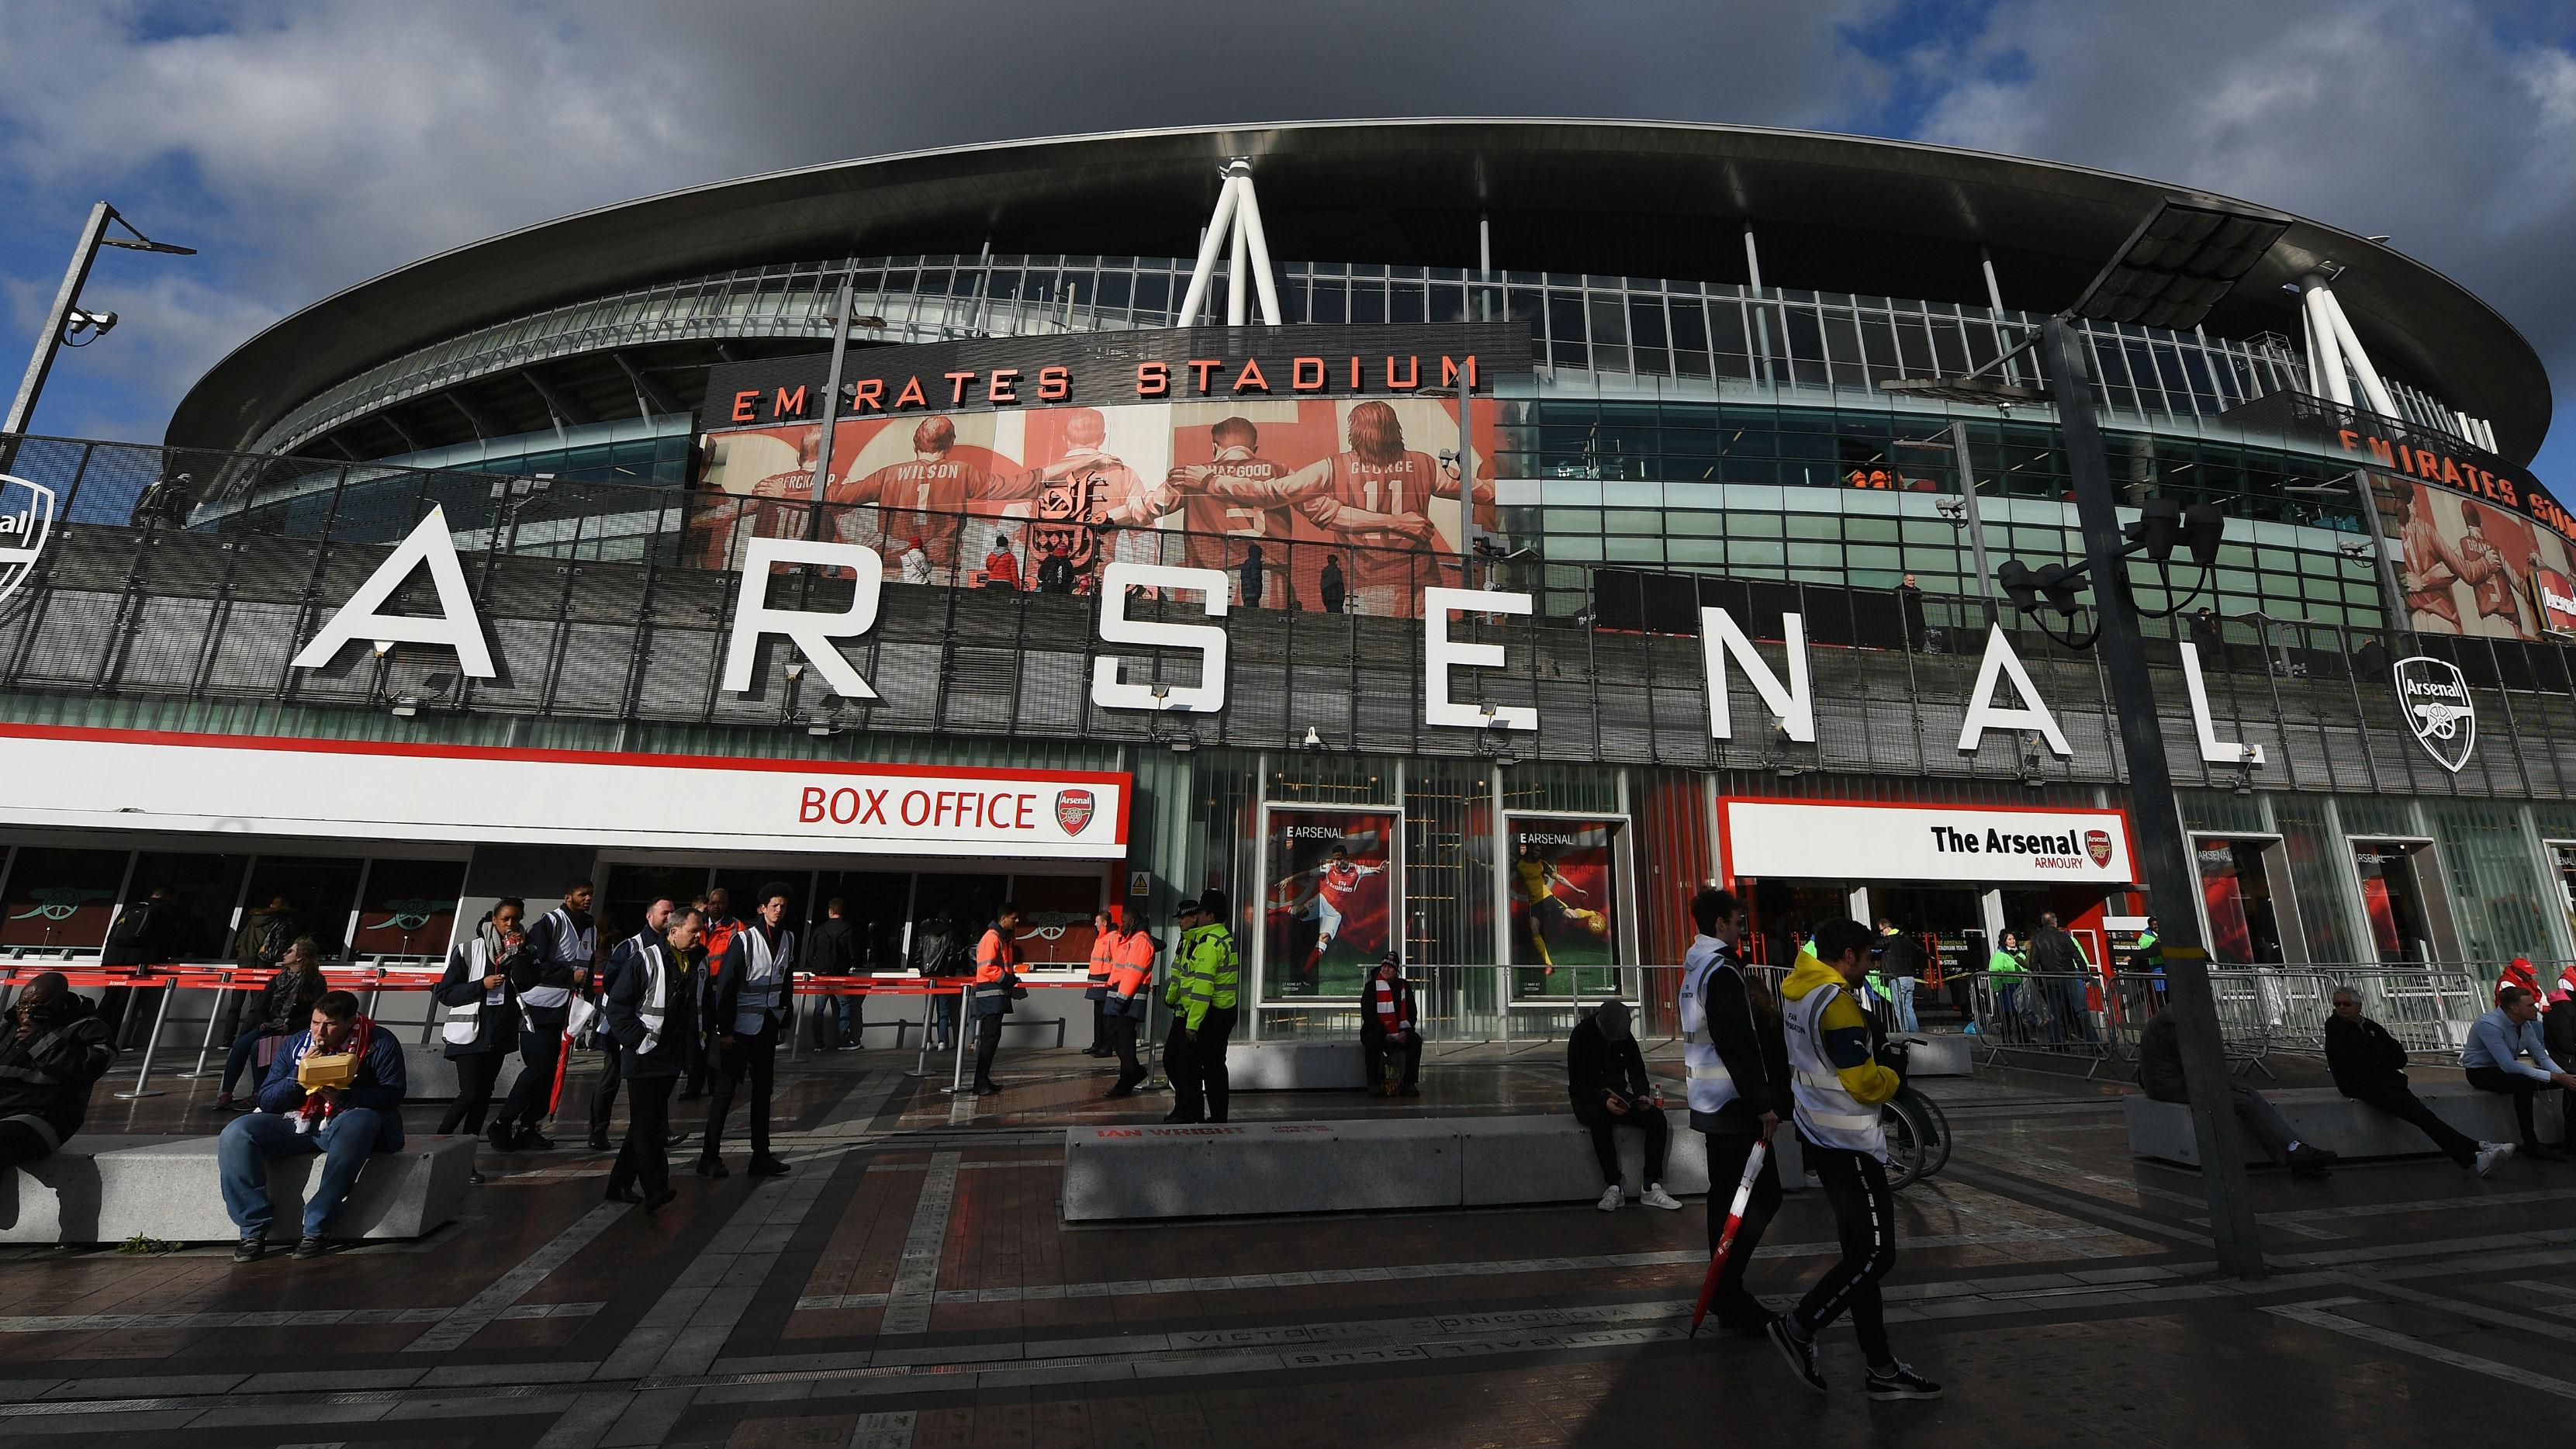 Arsenal Club Store at Emirates Stadium Raided by Burglars, Merchandise Stolen